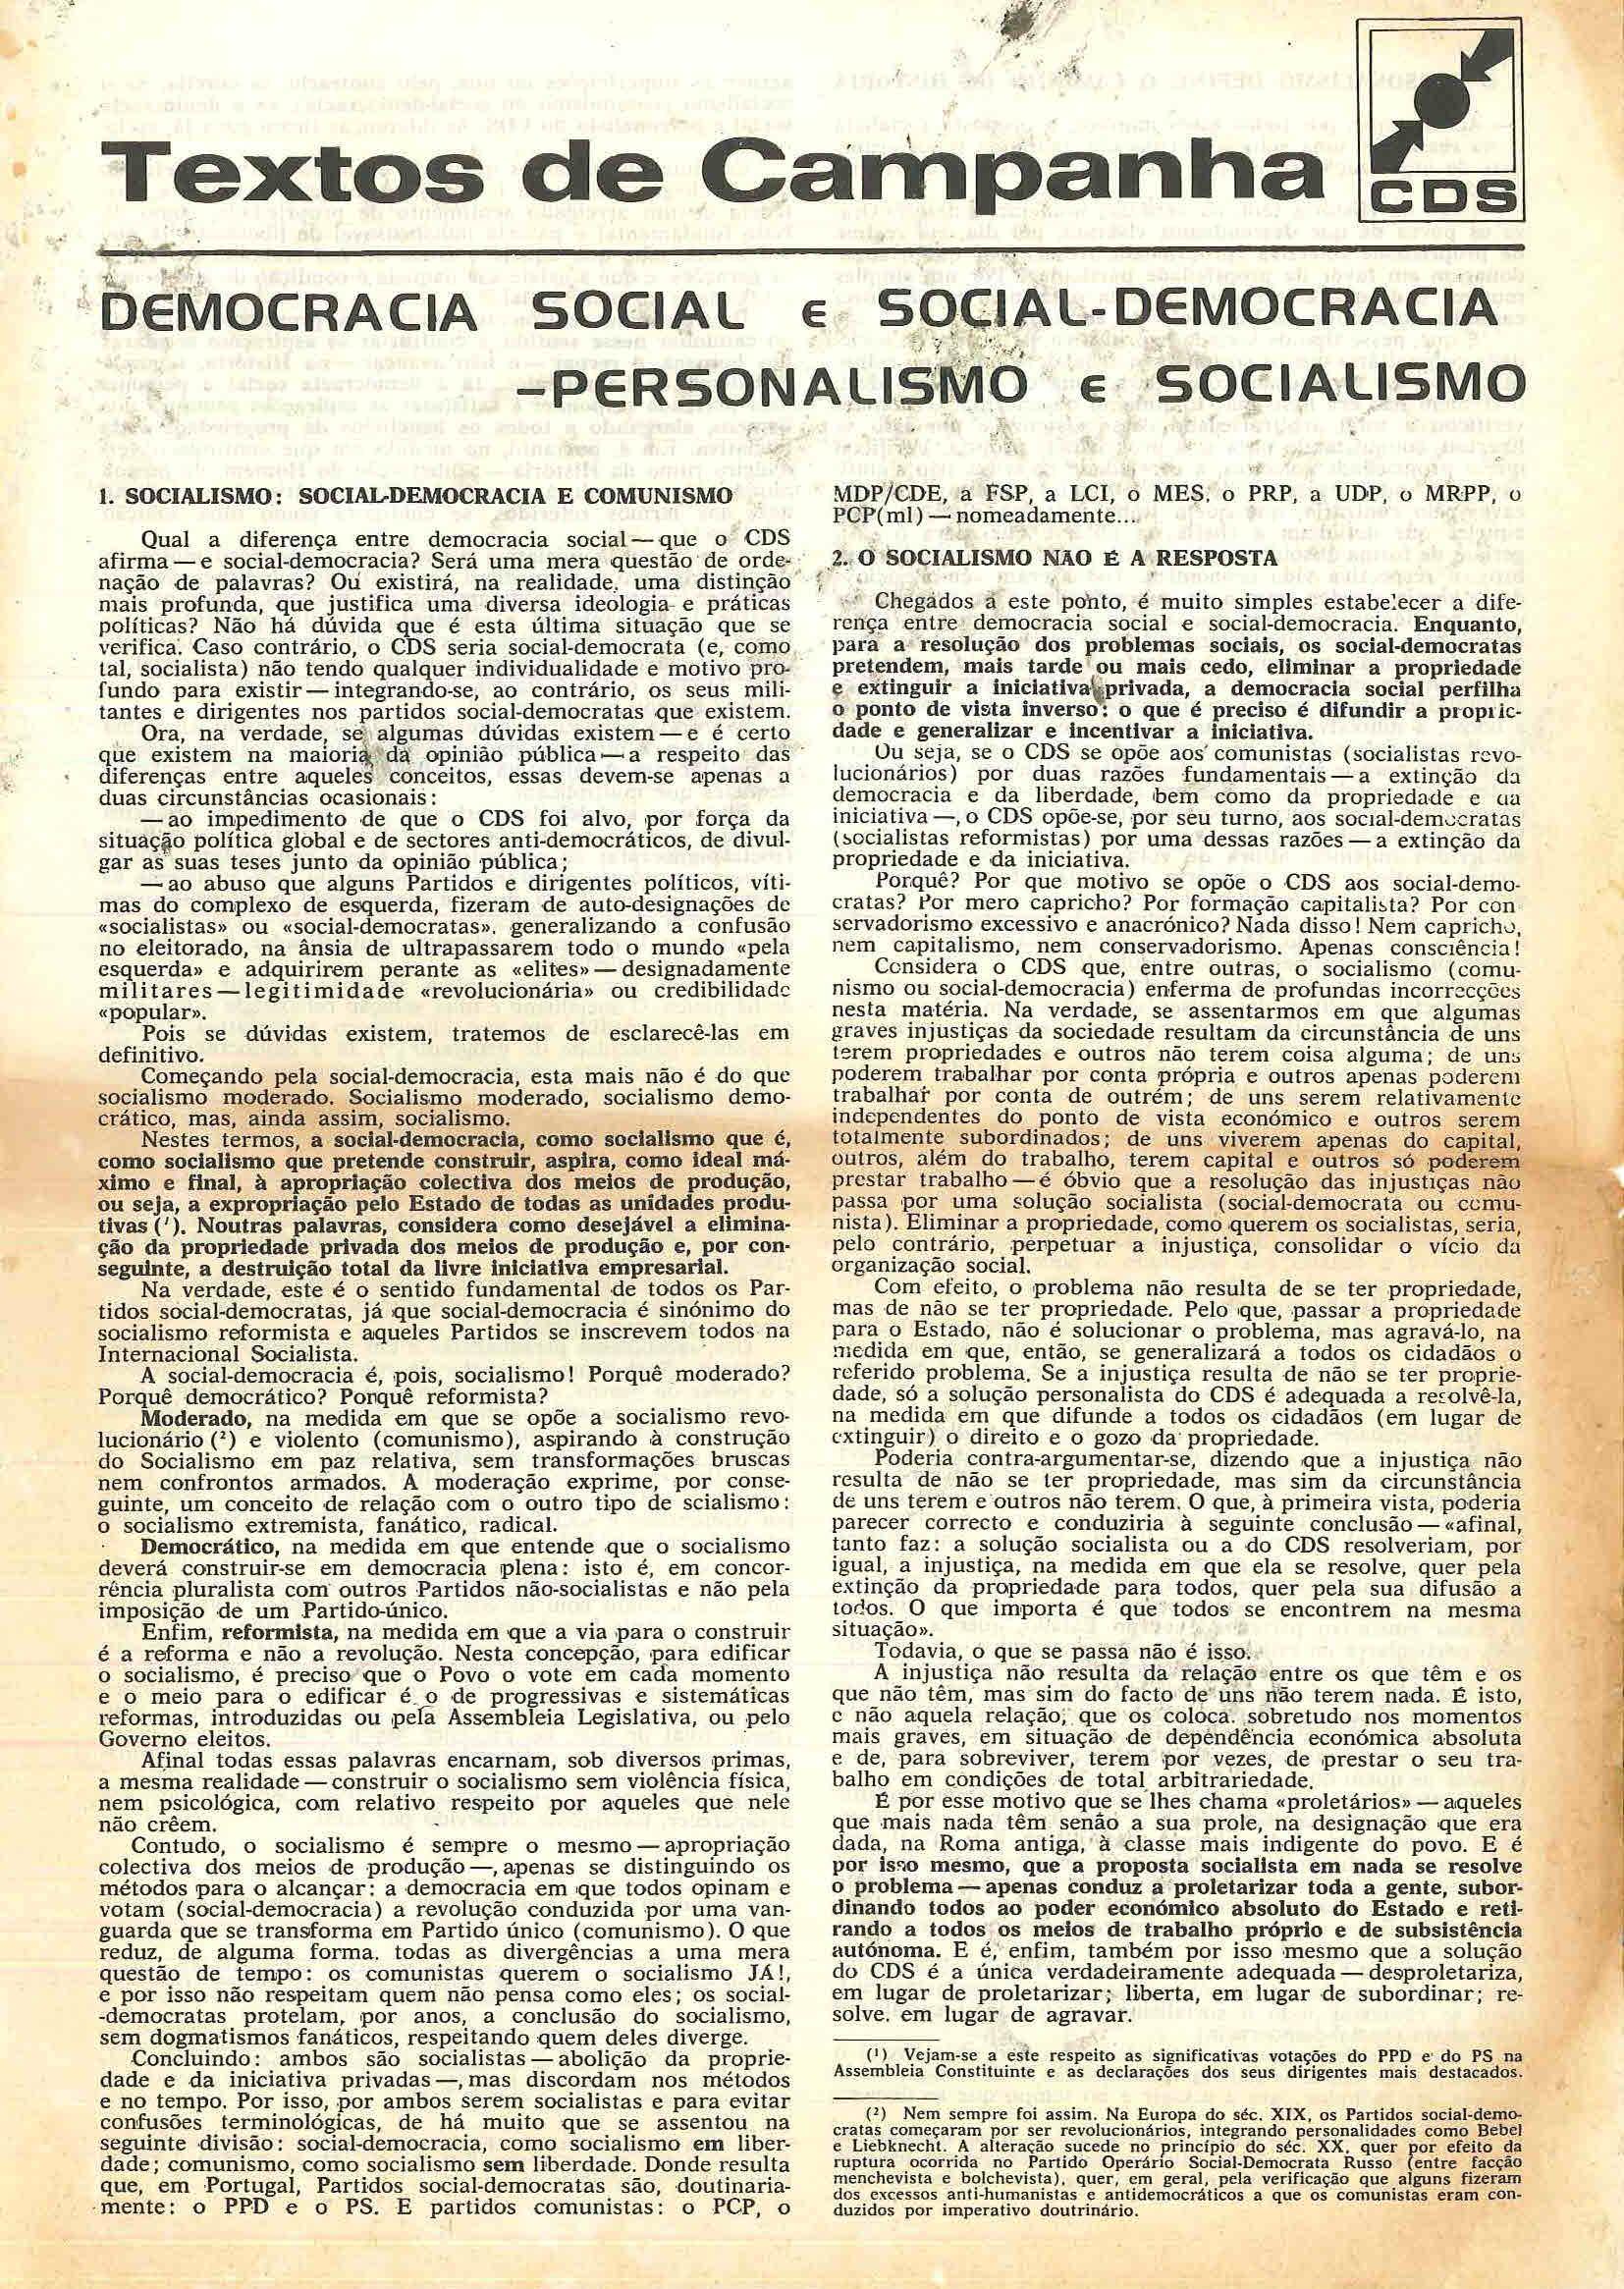 CDS_TextosCampanha_1